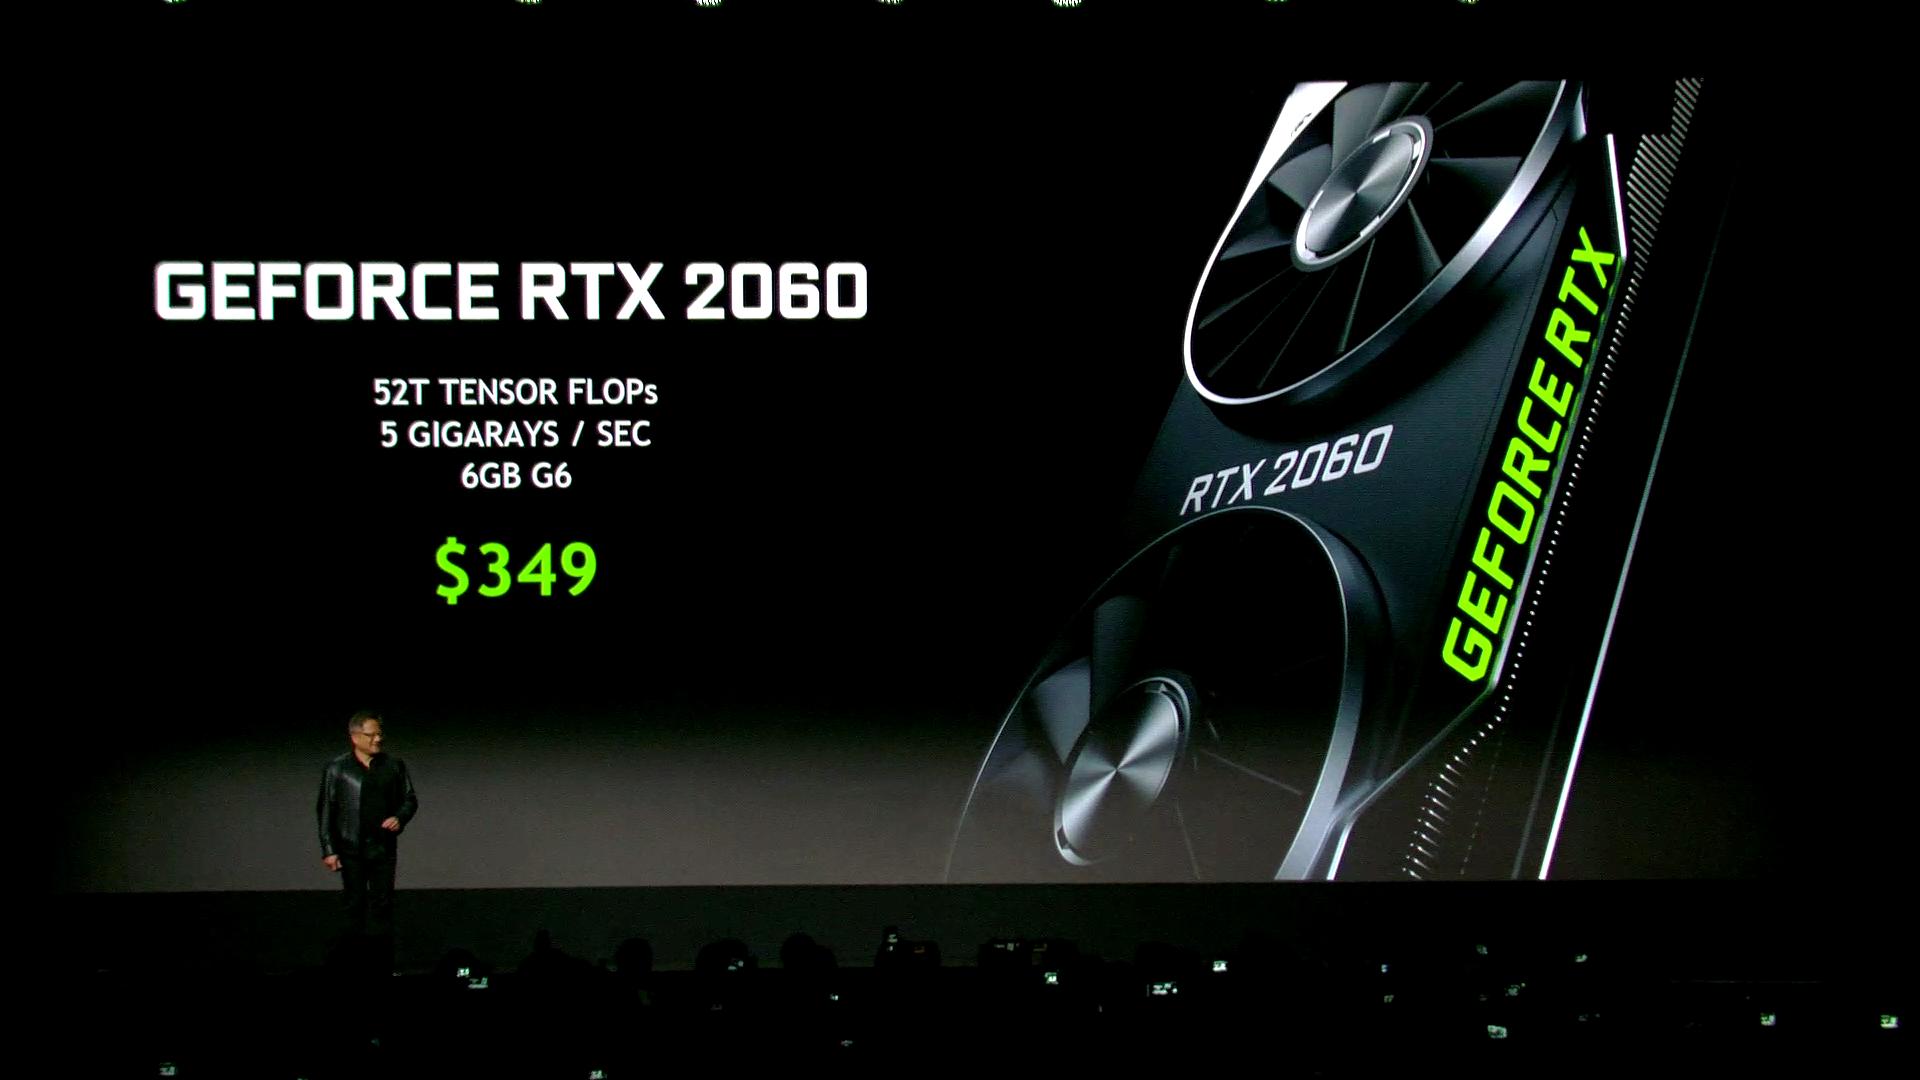 NVIDIA - มาแล้วการ์ดจอ GeForce RTX 2060 แรงไหม คุ้มไหม เรา